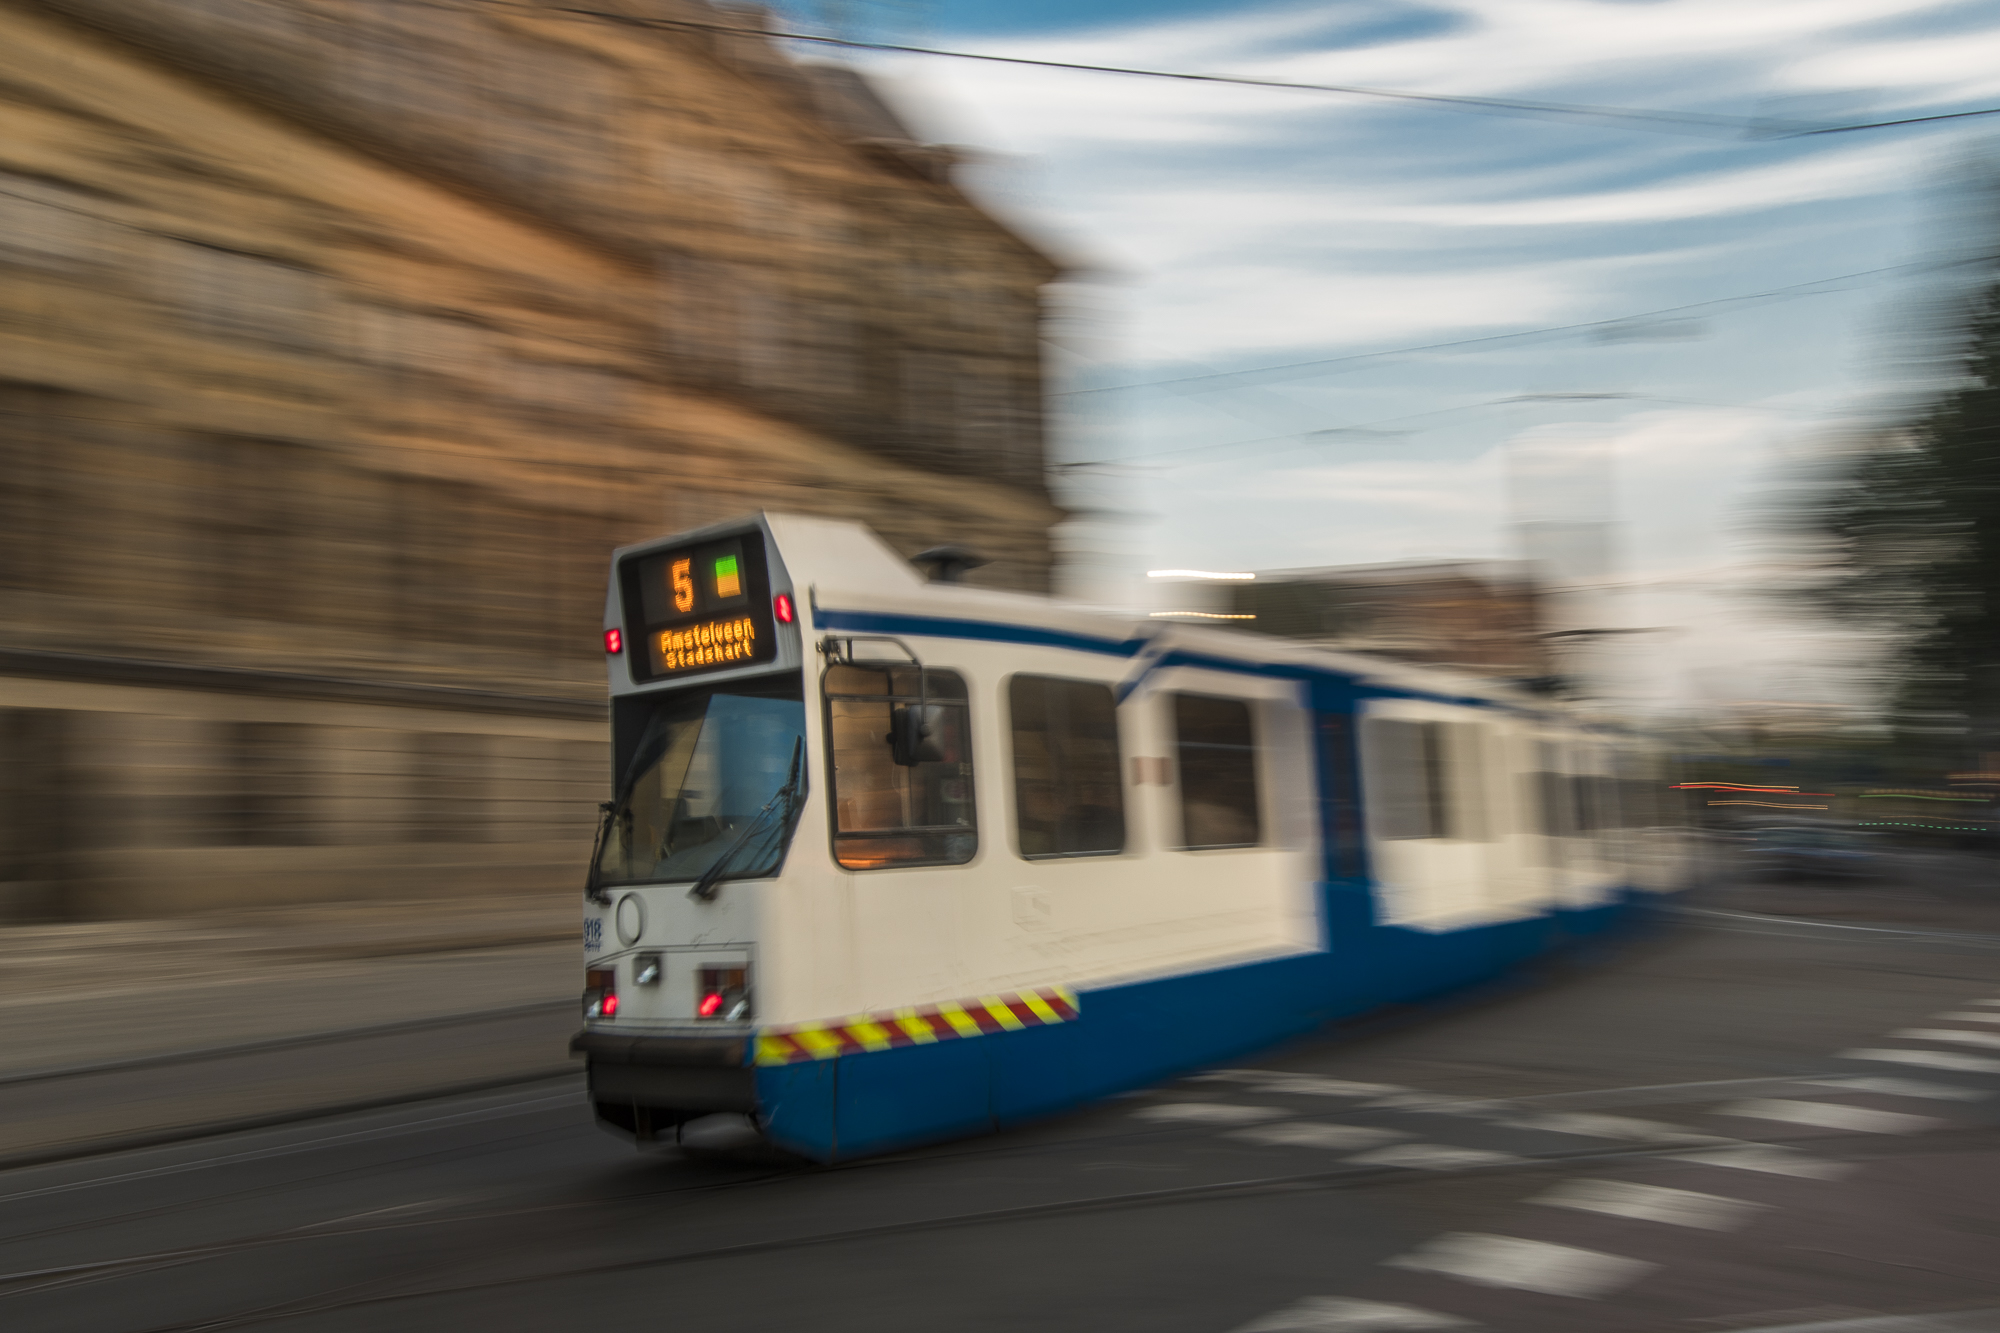 Amsterdam BN tram (on a tripod)  PHOTOGRAPHY: ALEXANDER J.E. BRADLEY • NIKON D500 • AF-S NIKKOR 14-24MM Ƒ/2.8G ED @ 14MM • Ƒ/16 • 1/6• ISO 50